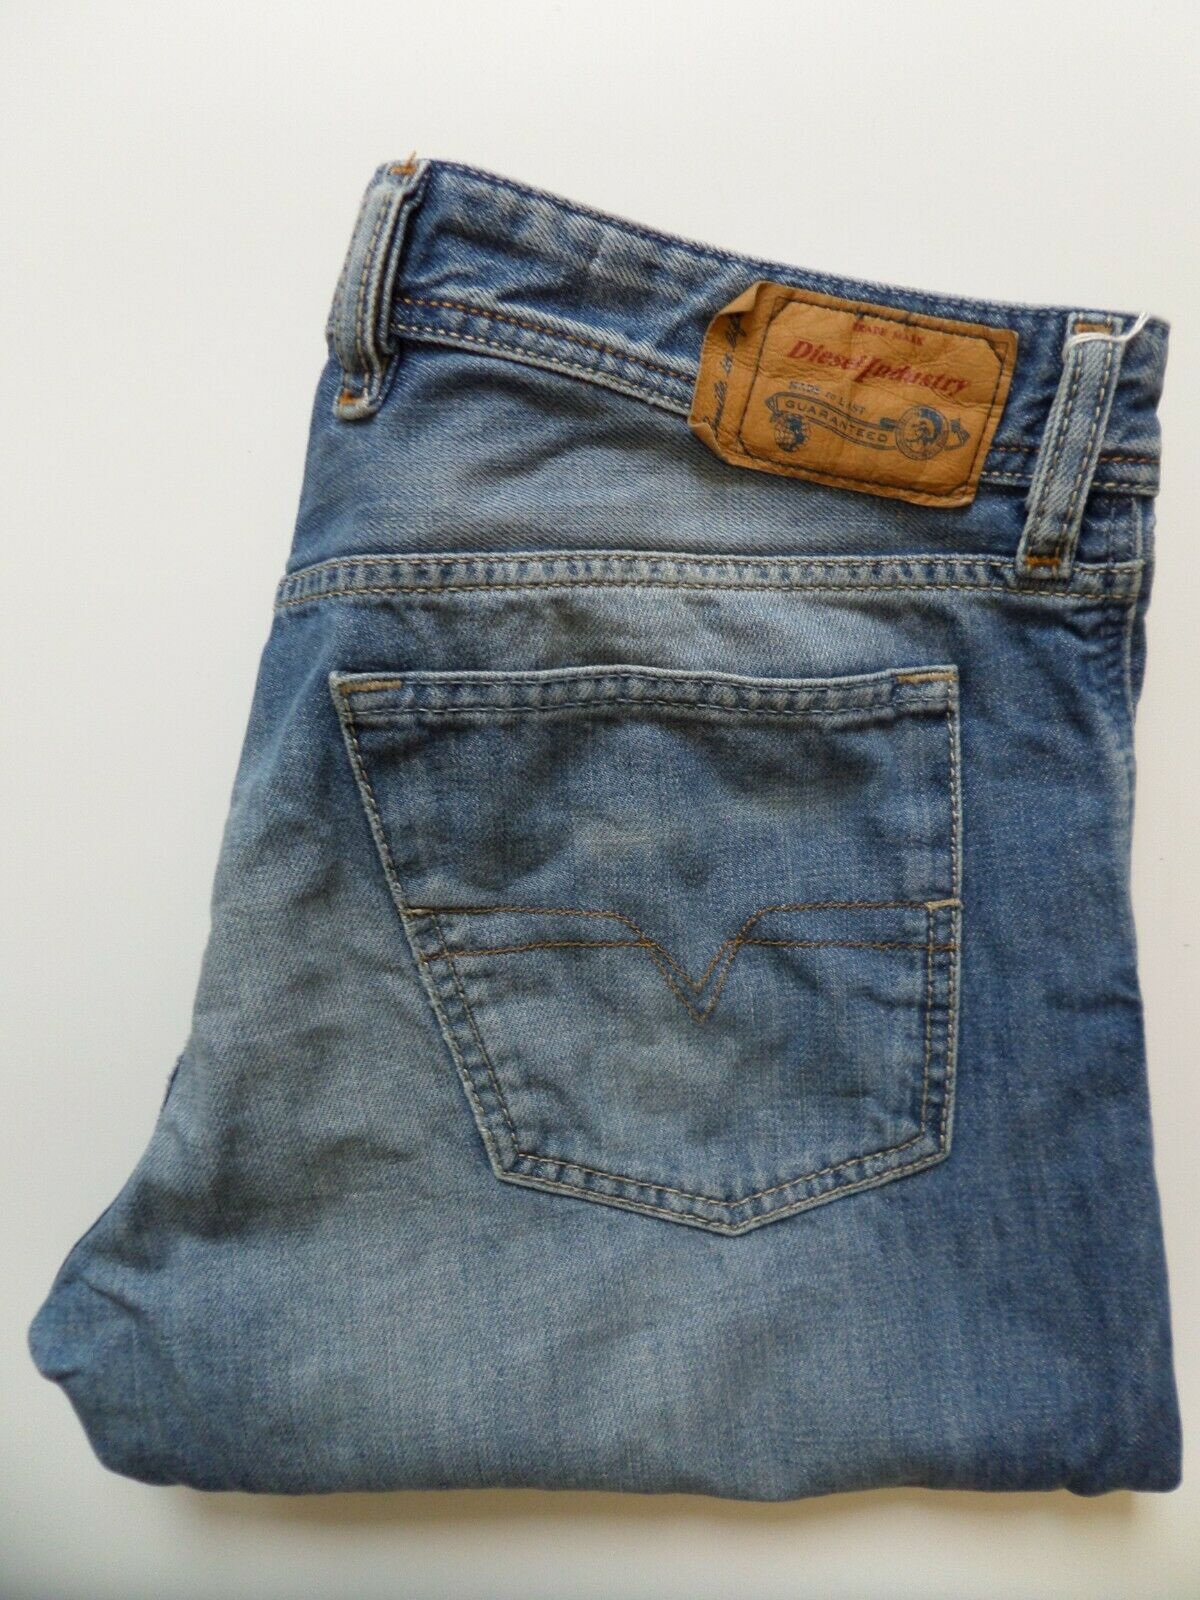 DIESEL DIESEL DIESEL Jeans Waykee Regolare Dritto Fit W34 L30 Blu Slavato 0839C Mid levp 395 4980f3